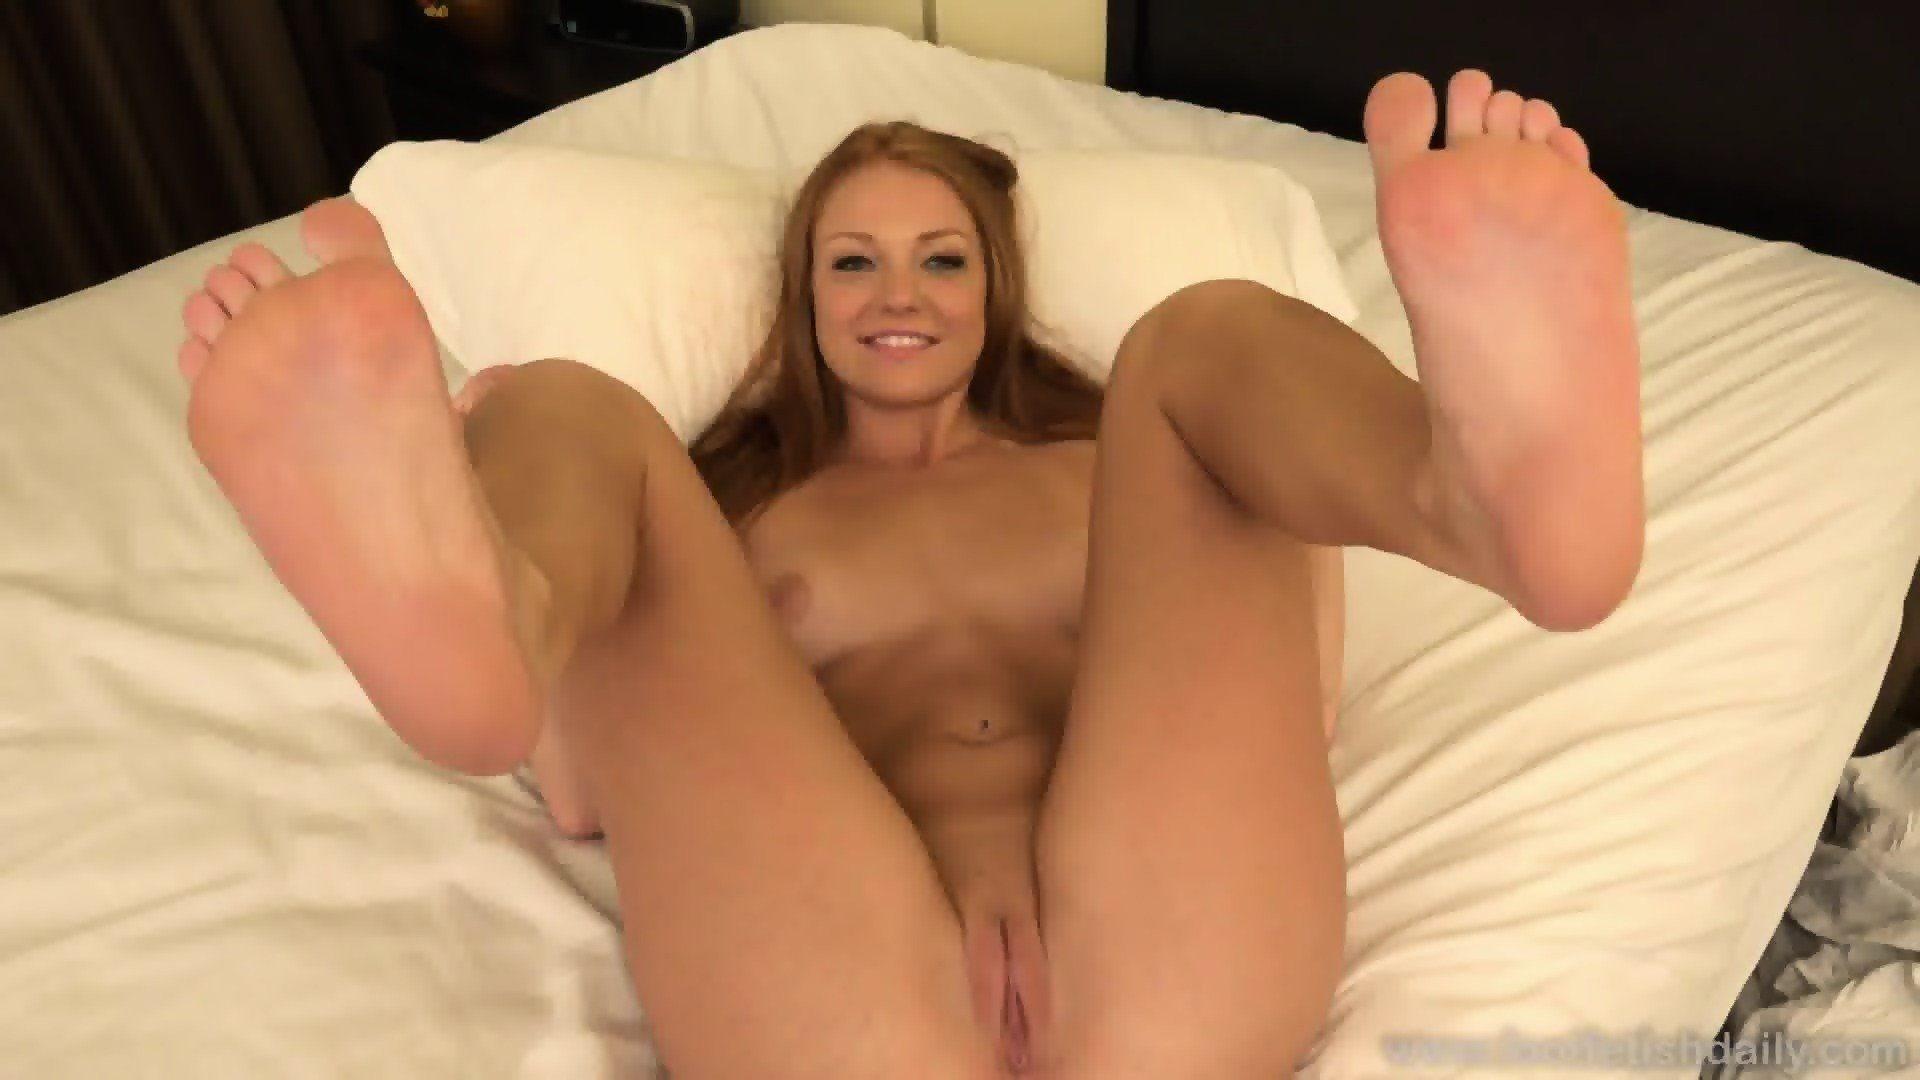 Woman fucks guys ass with dildo